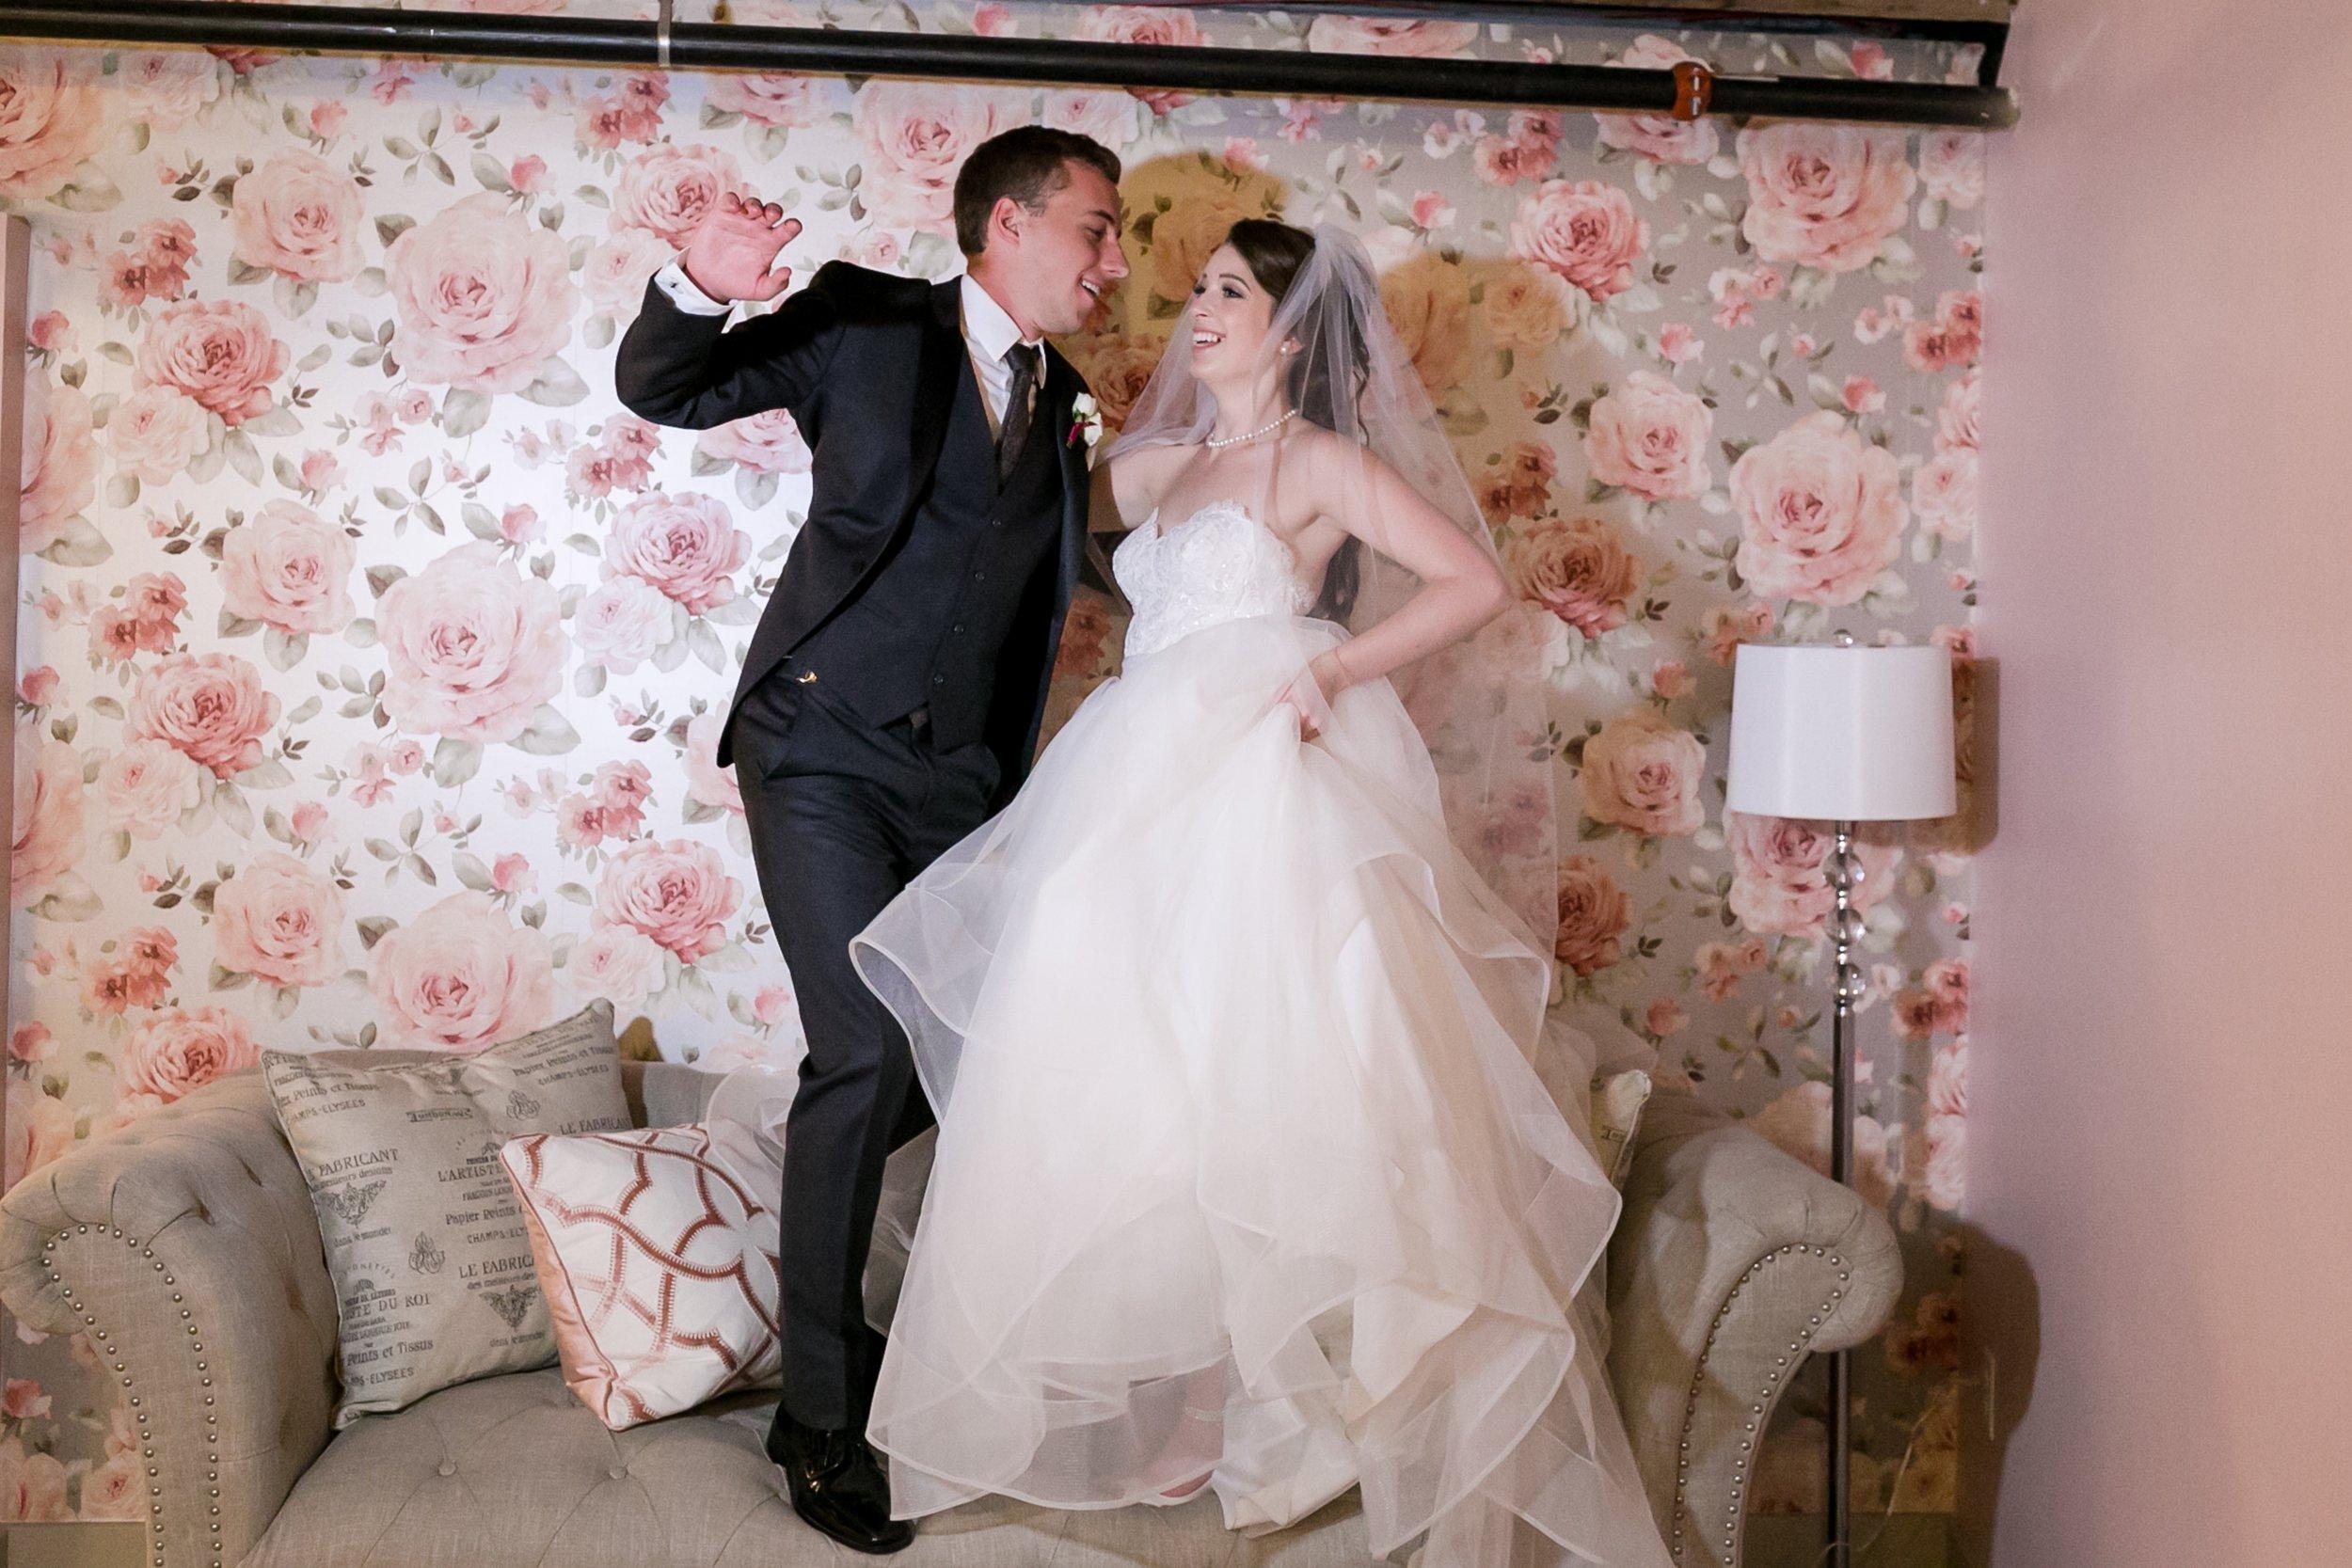 2017Sept9-Kay-Wedding-MissionTheatre-0772.jpg